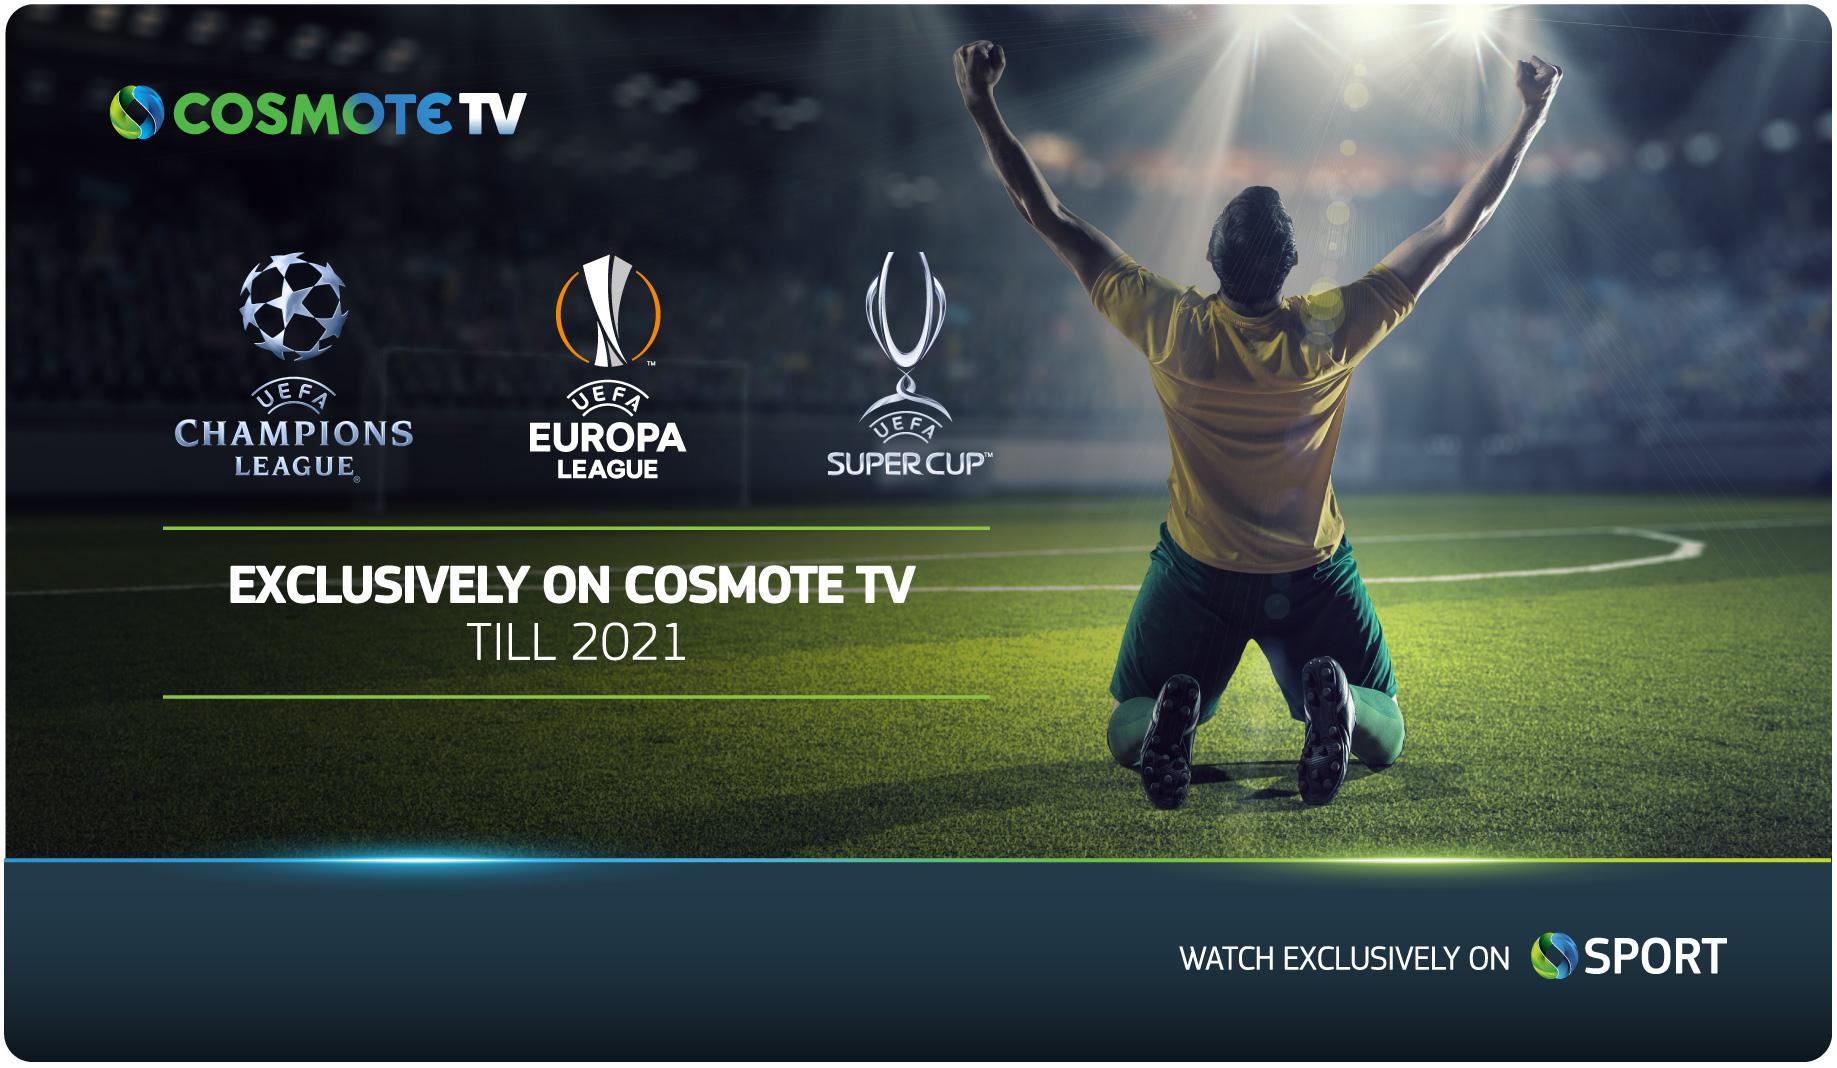 Champions League Tv 2021